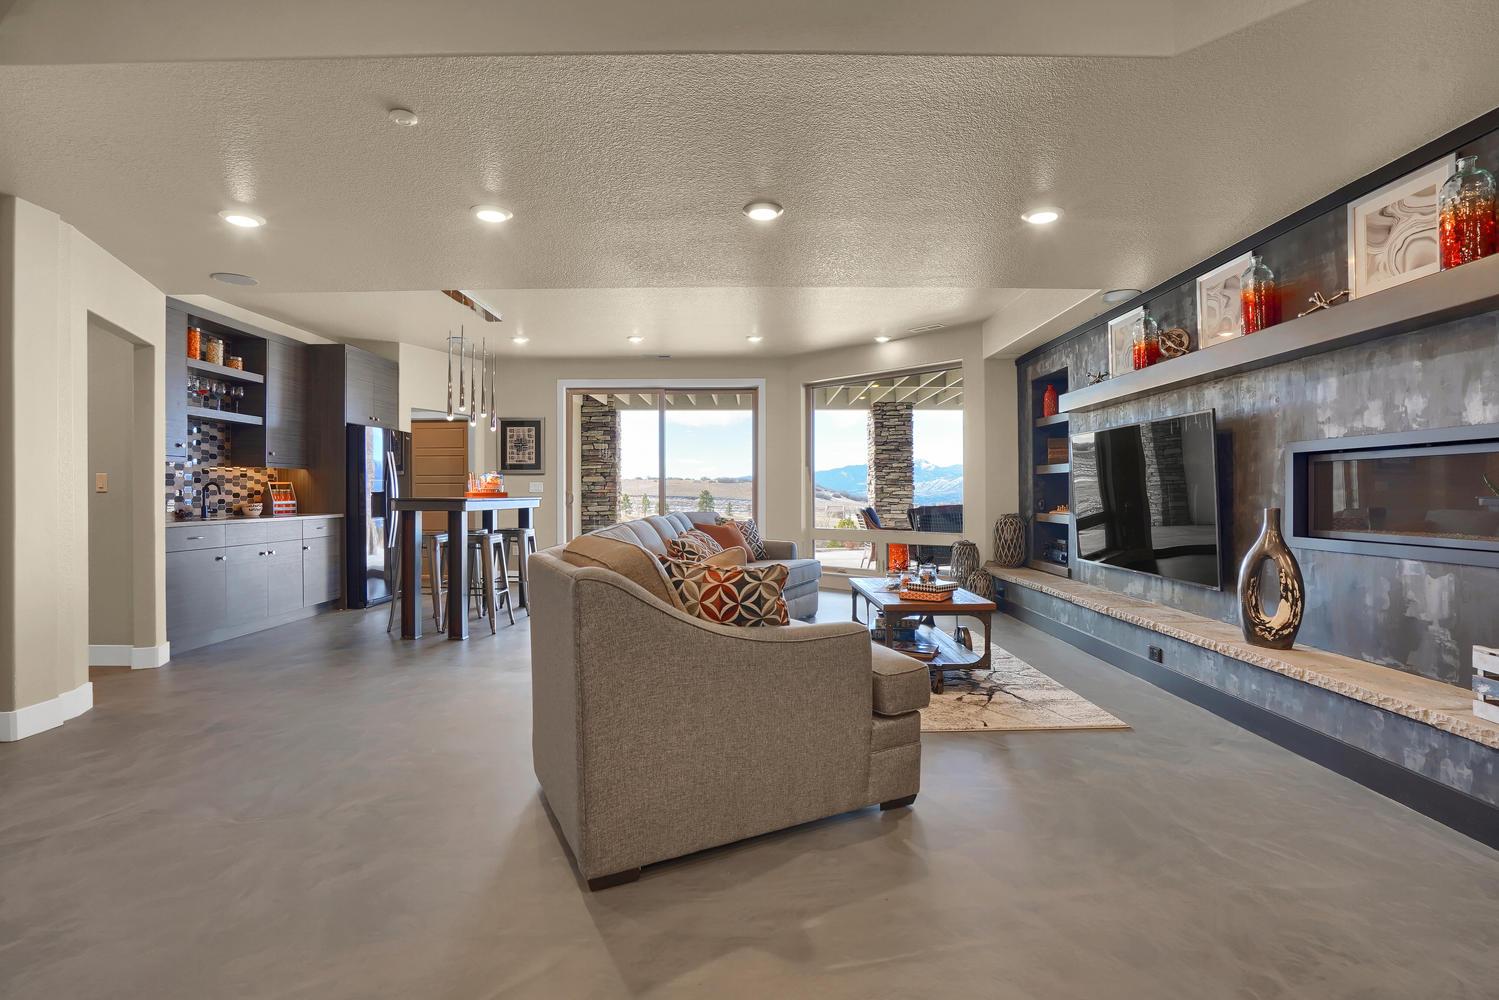 1807 Redbank Dr Colorado-large-037-35-Recreation Room-1499x1000-72dpi.jpg